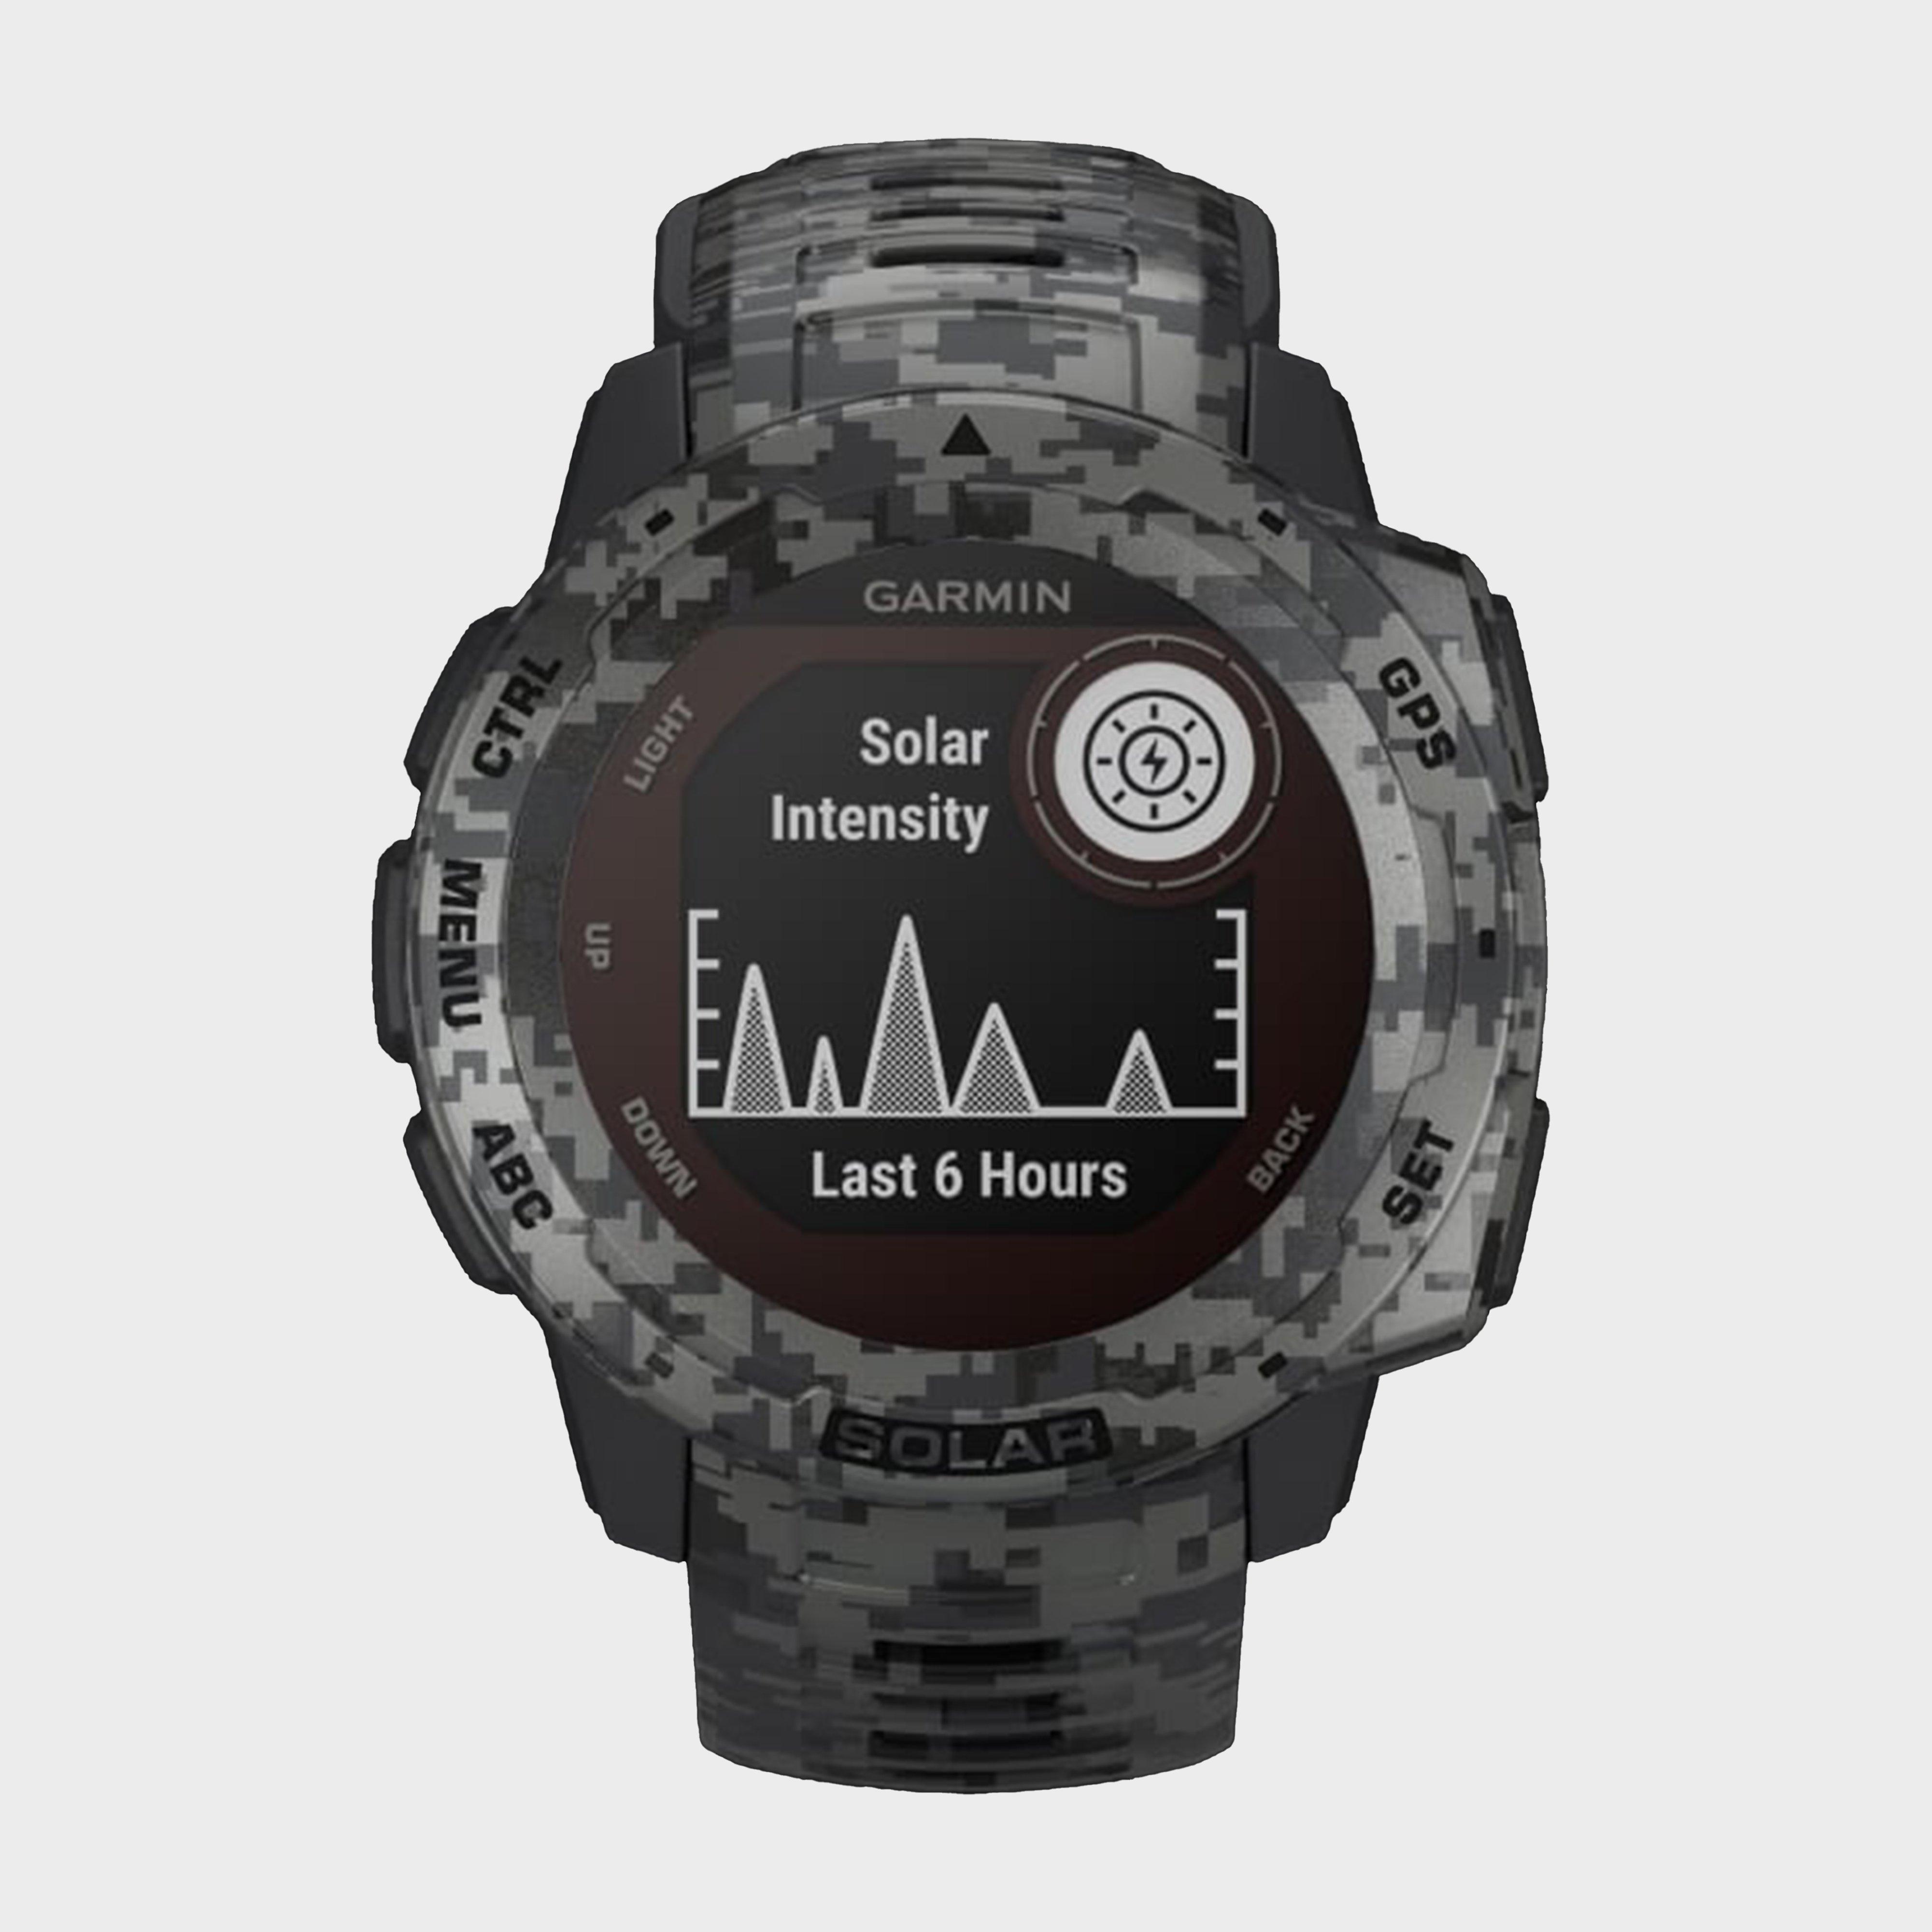 Garmin Instinct Solar Edition Multi-sport Gps Watch - Grey/blk/camo  Grey/blk/camo